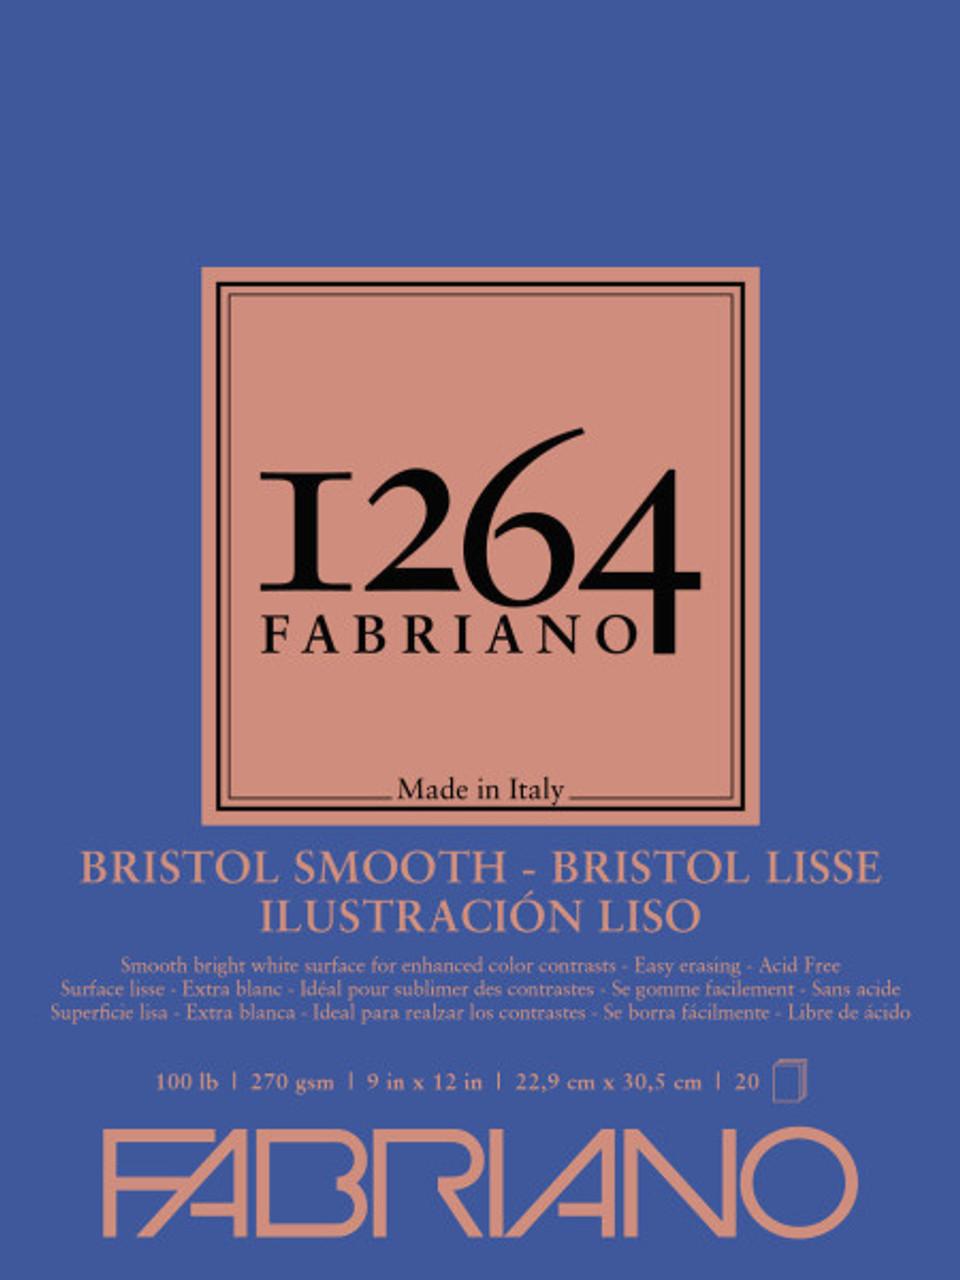 Fabriano 1264 Smooth Bristol Pad